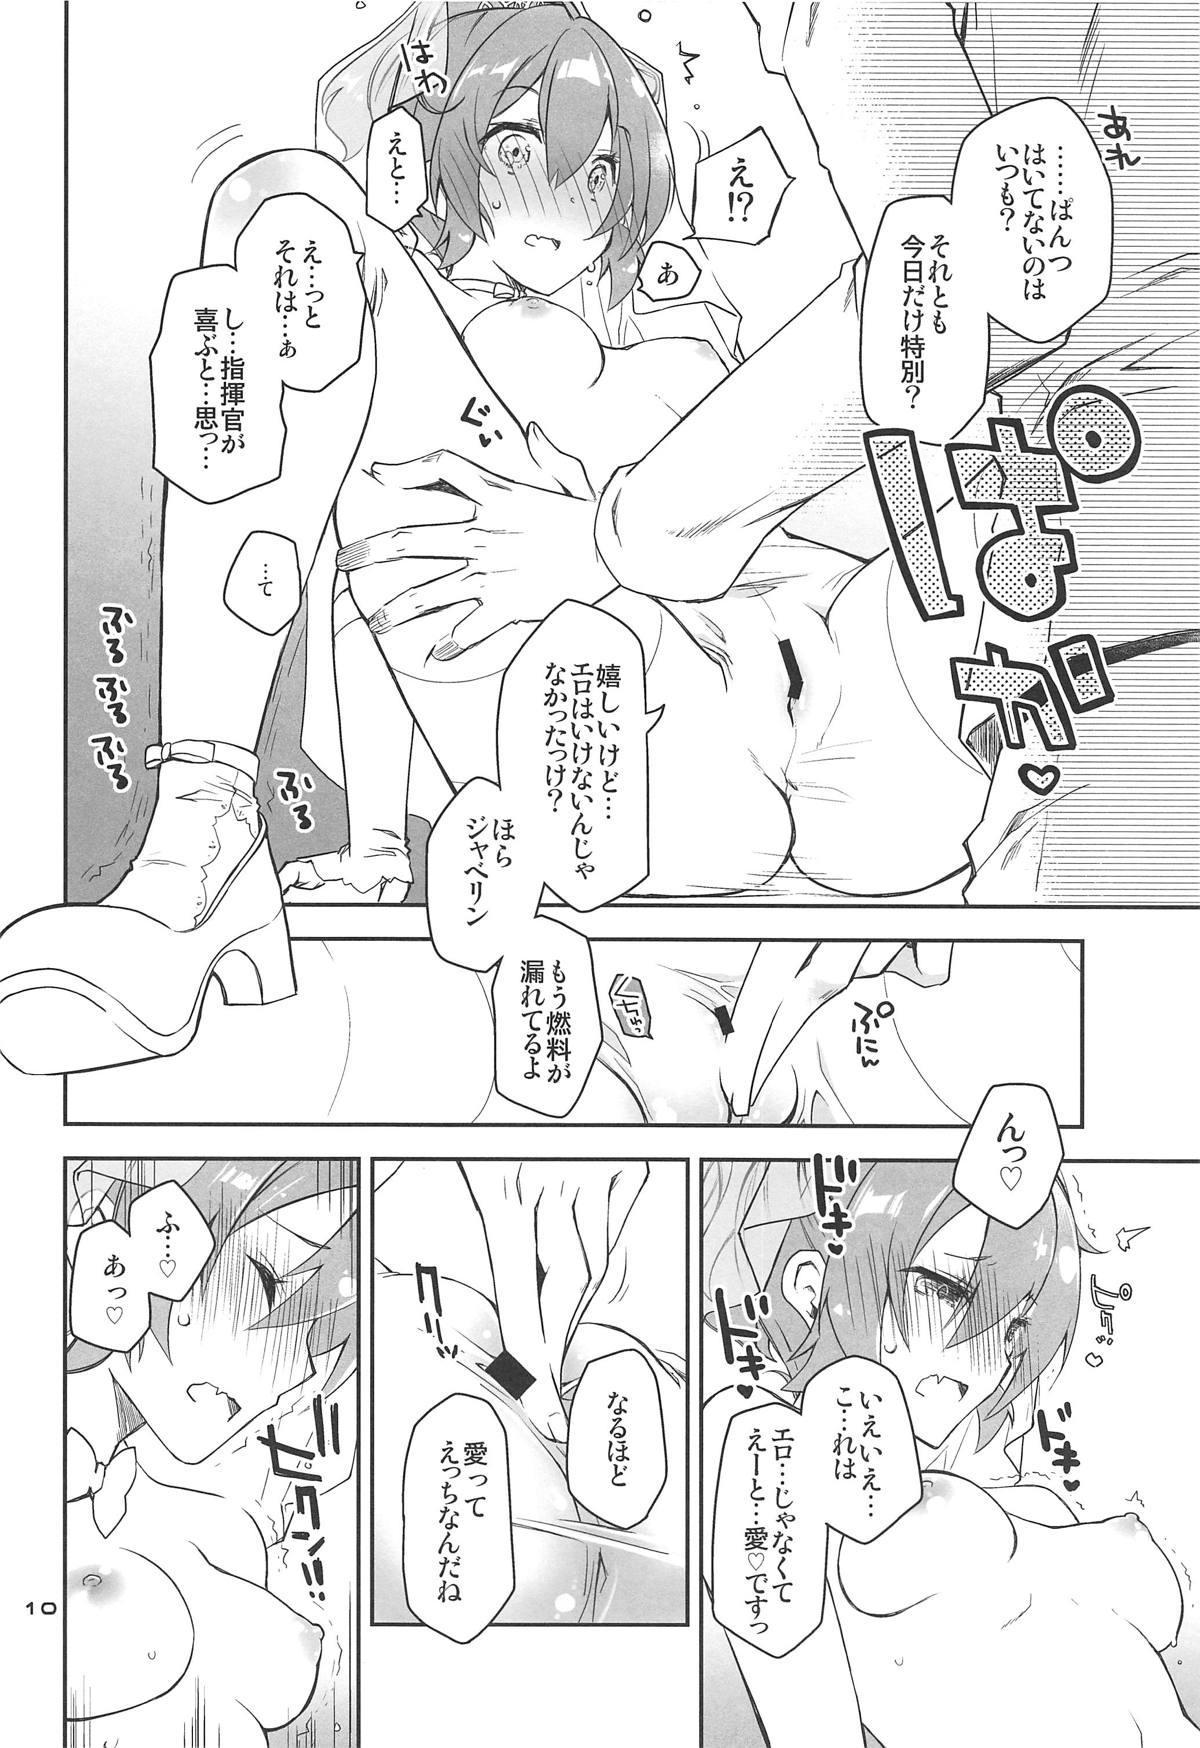 Mukakin Shikikan wa Javelin ni Eien no Ai o Chikau 8